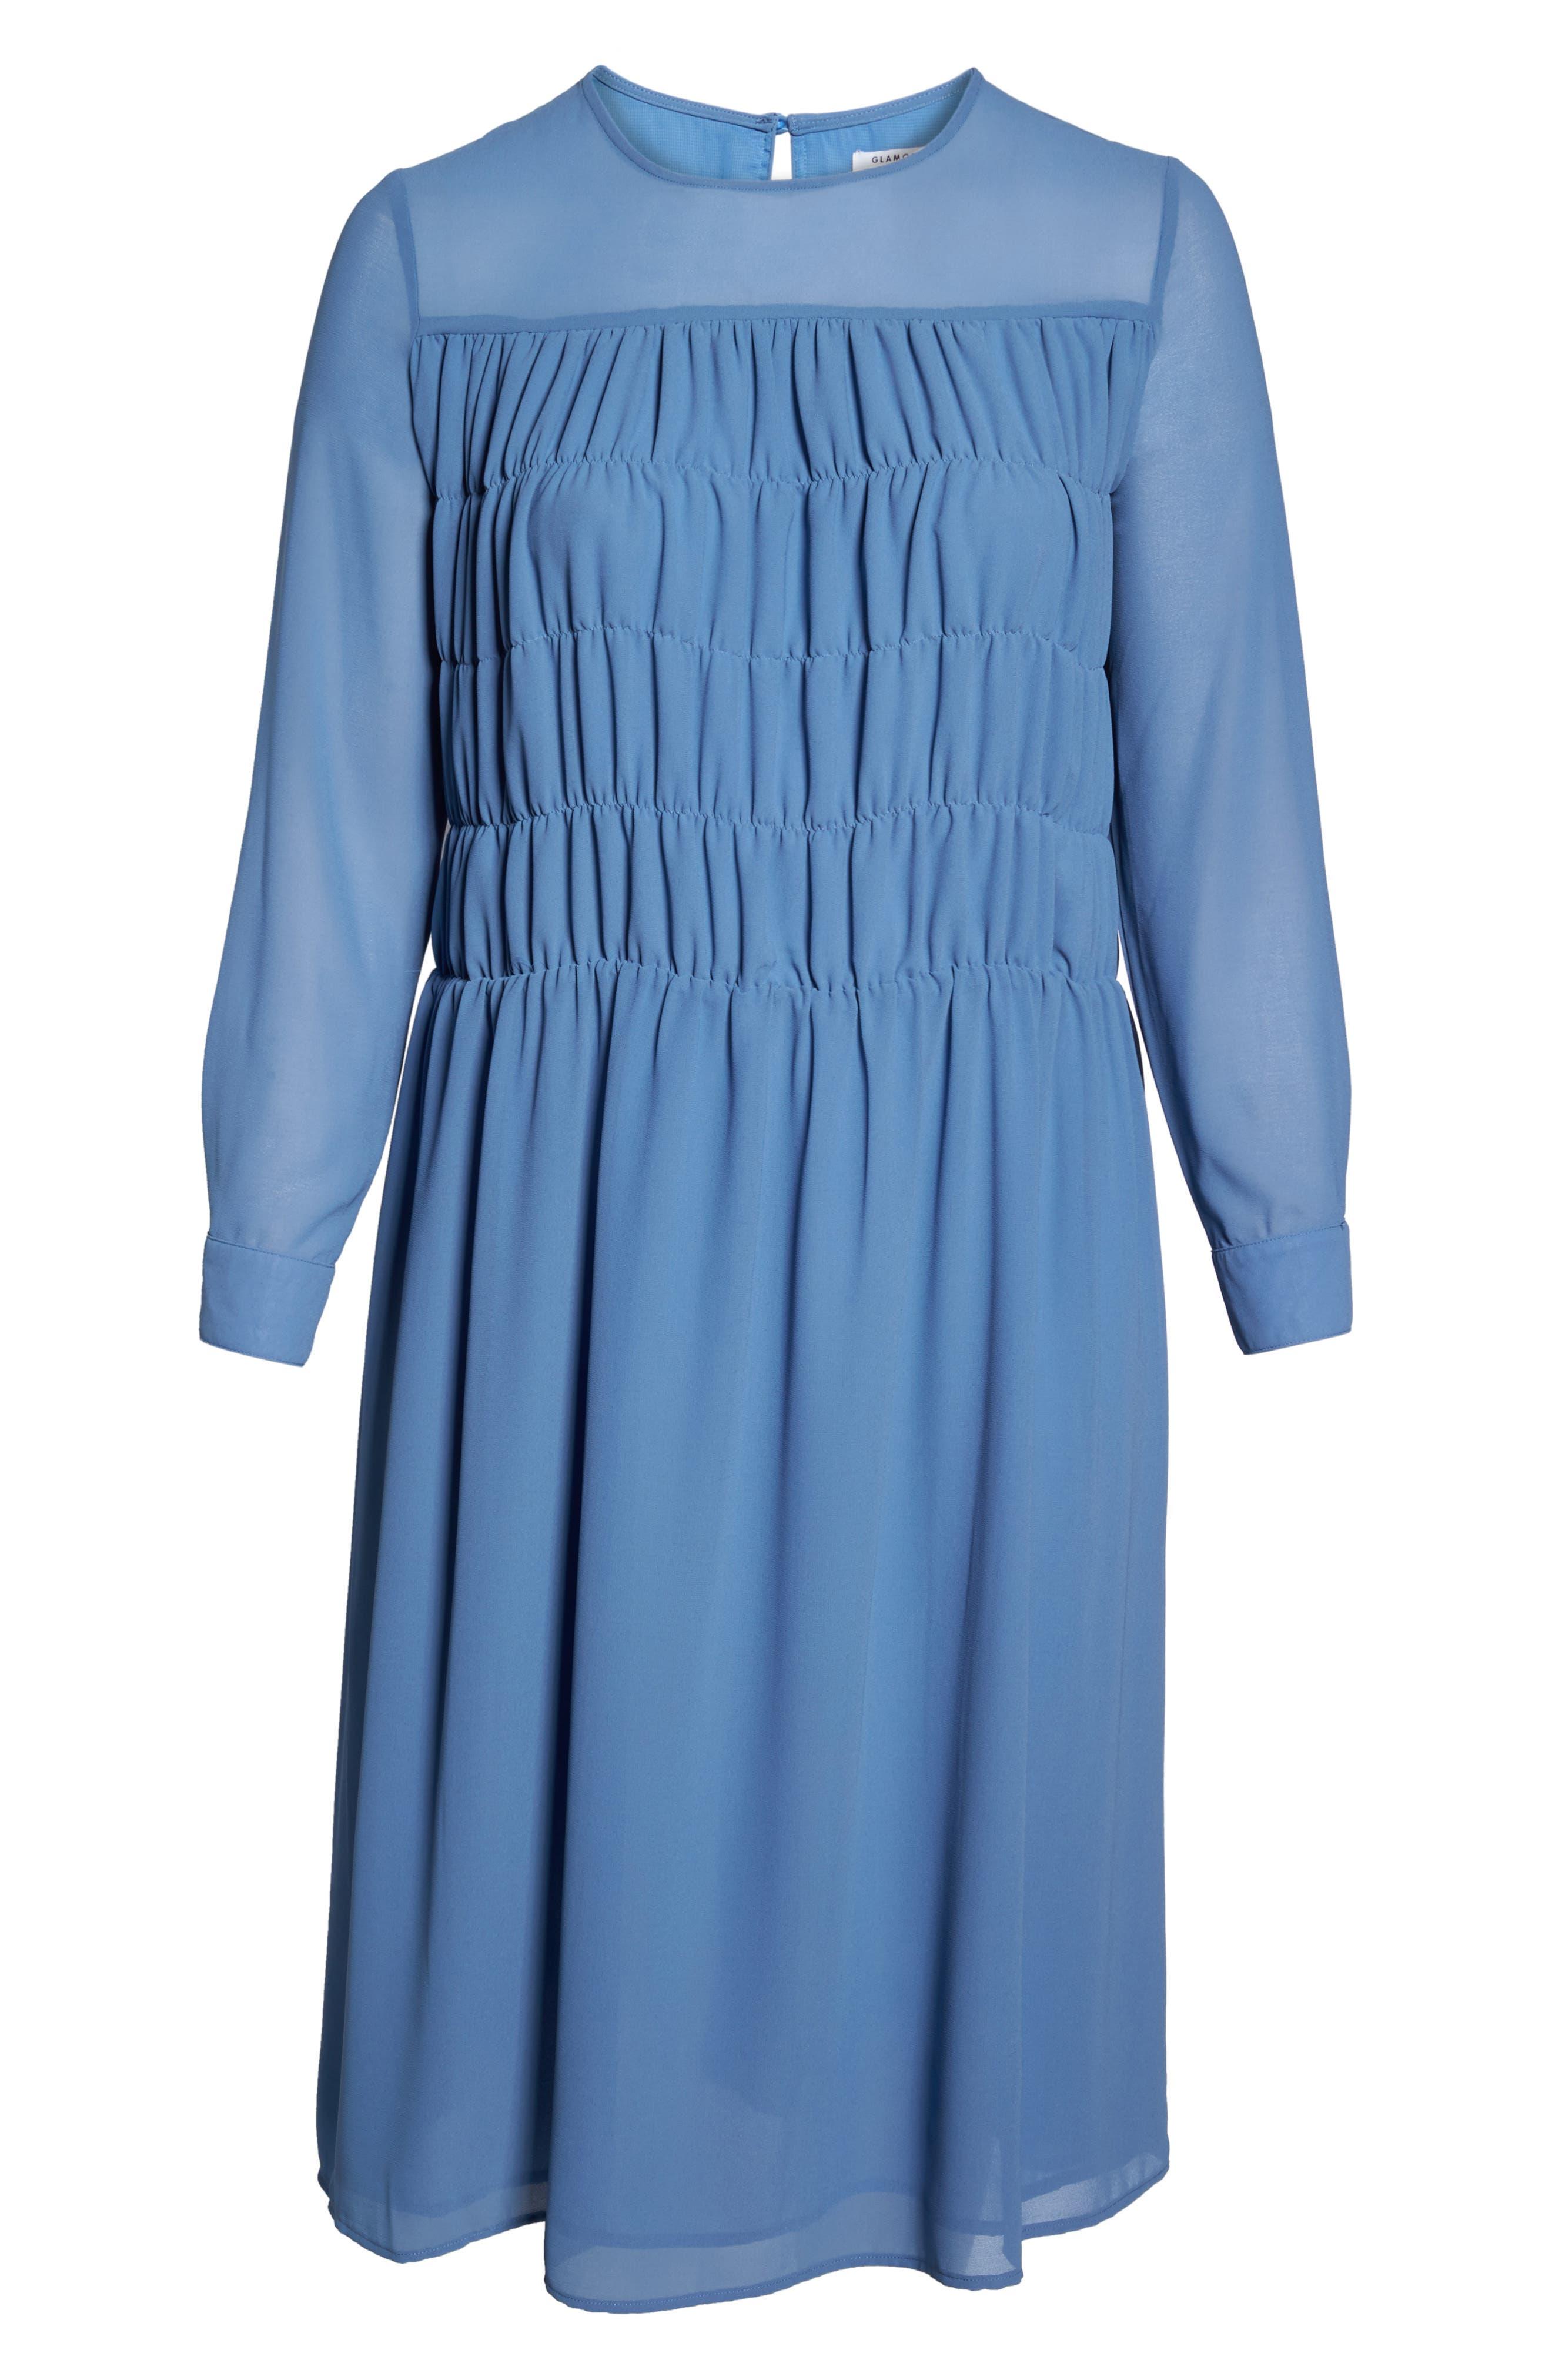 Smocked Chiffon Dress,                             Alternate thumbnail 6, color,                             400